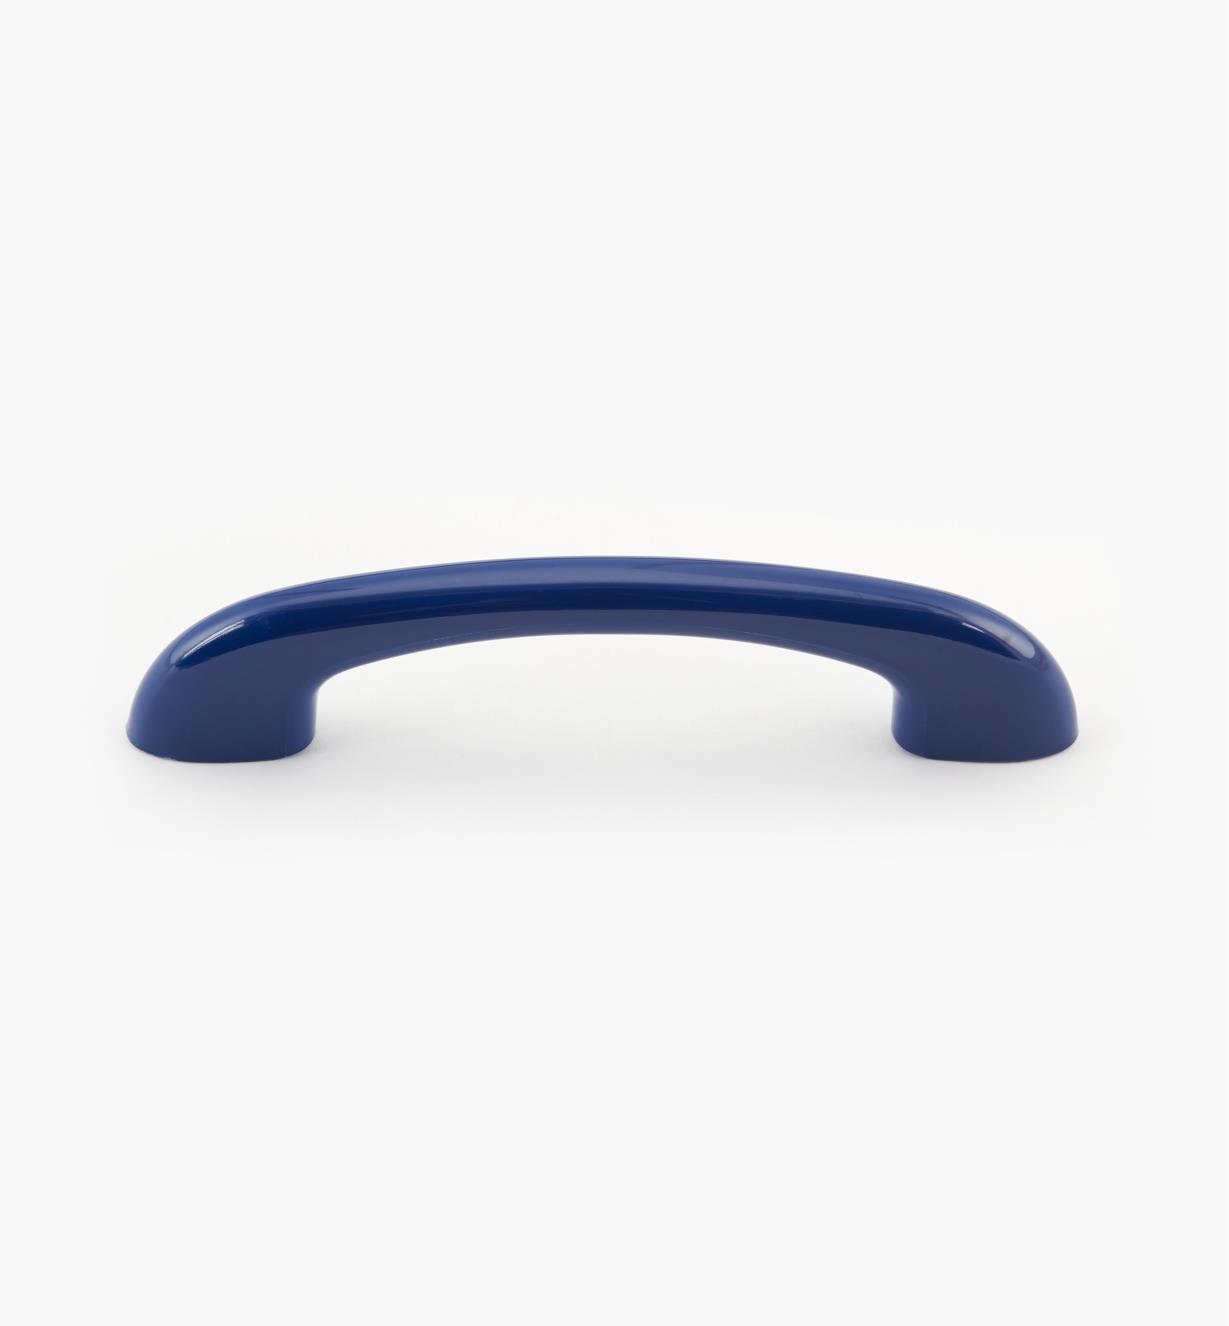 00W3516 - Spectrum Blue Handle